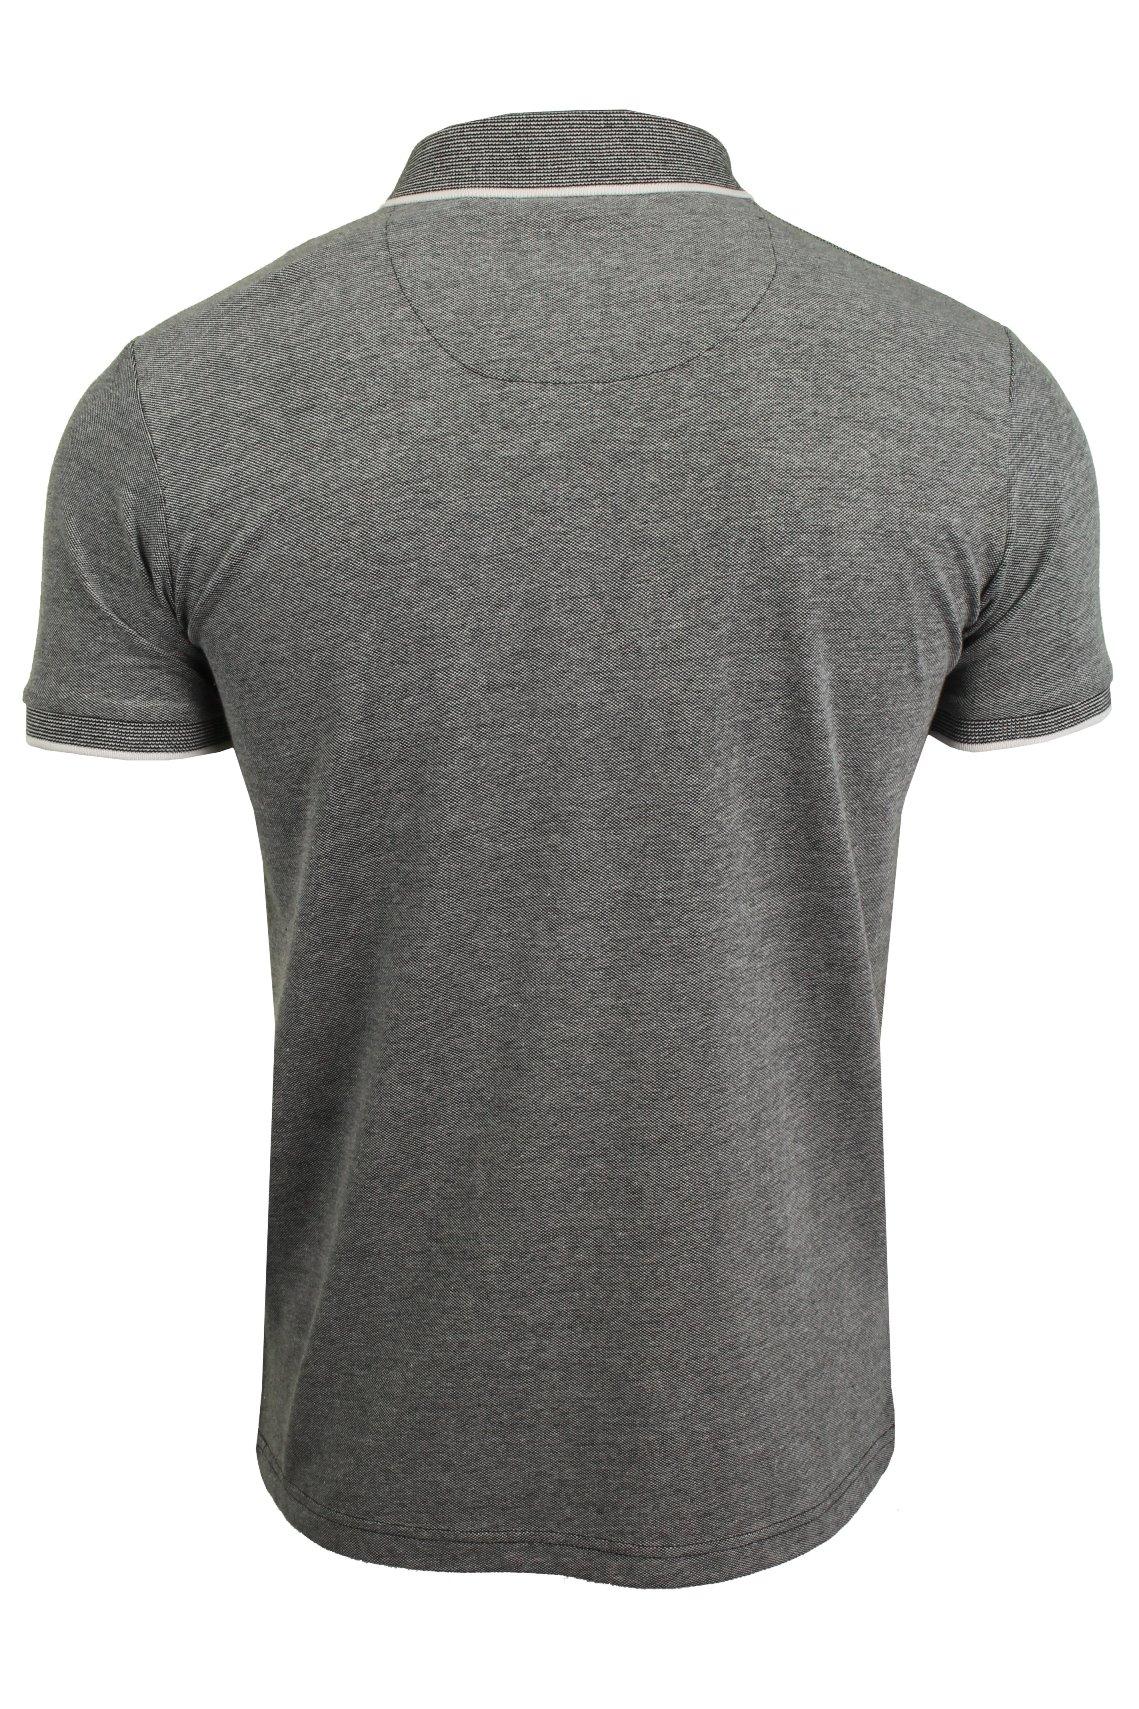 Brave-Soul-Mens-Polo-T-Shirt-Birdseye-Pique-Short-Sleeved thumbnail 5